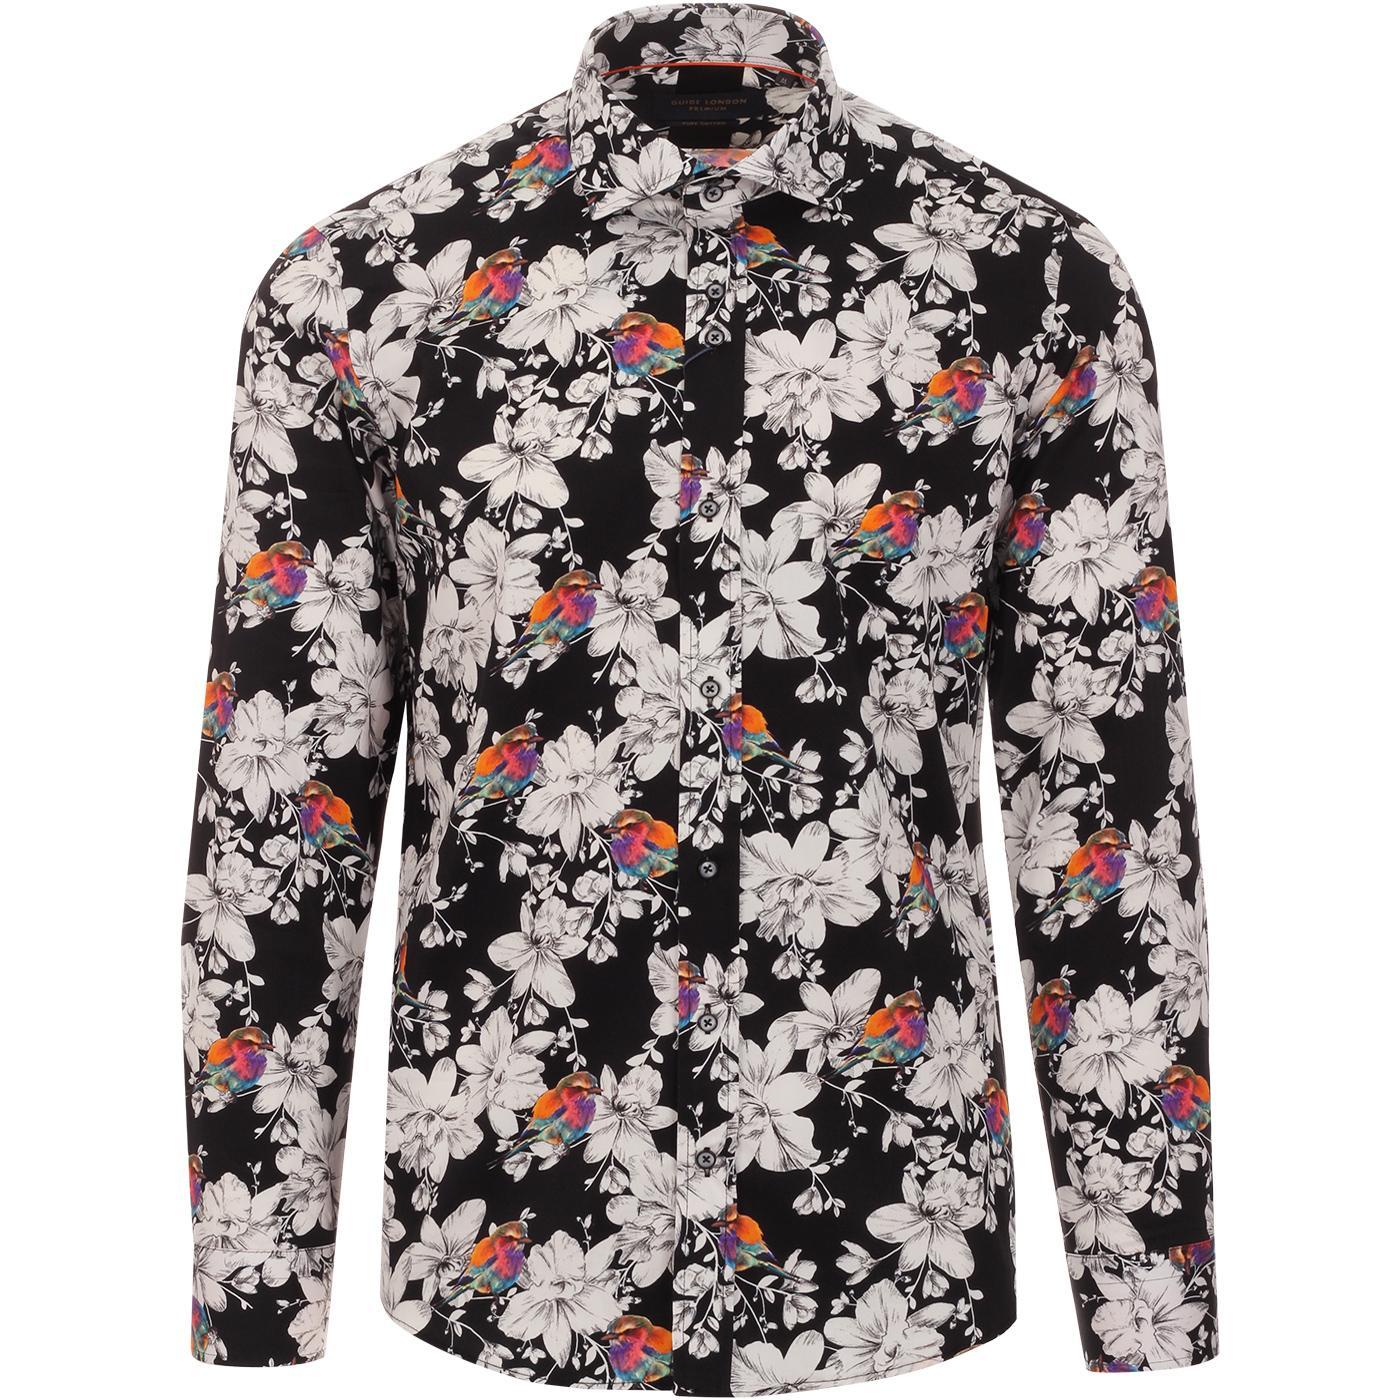 GUIDE LONDON Men's Retro 1960s Floral Bird Shirt